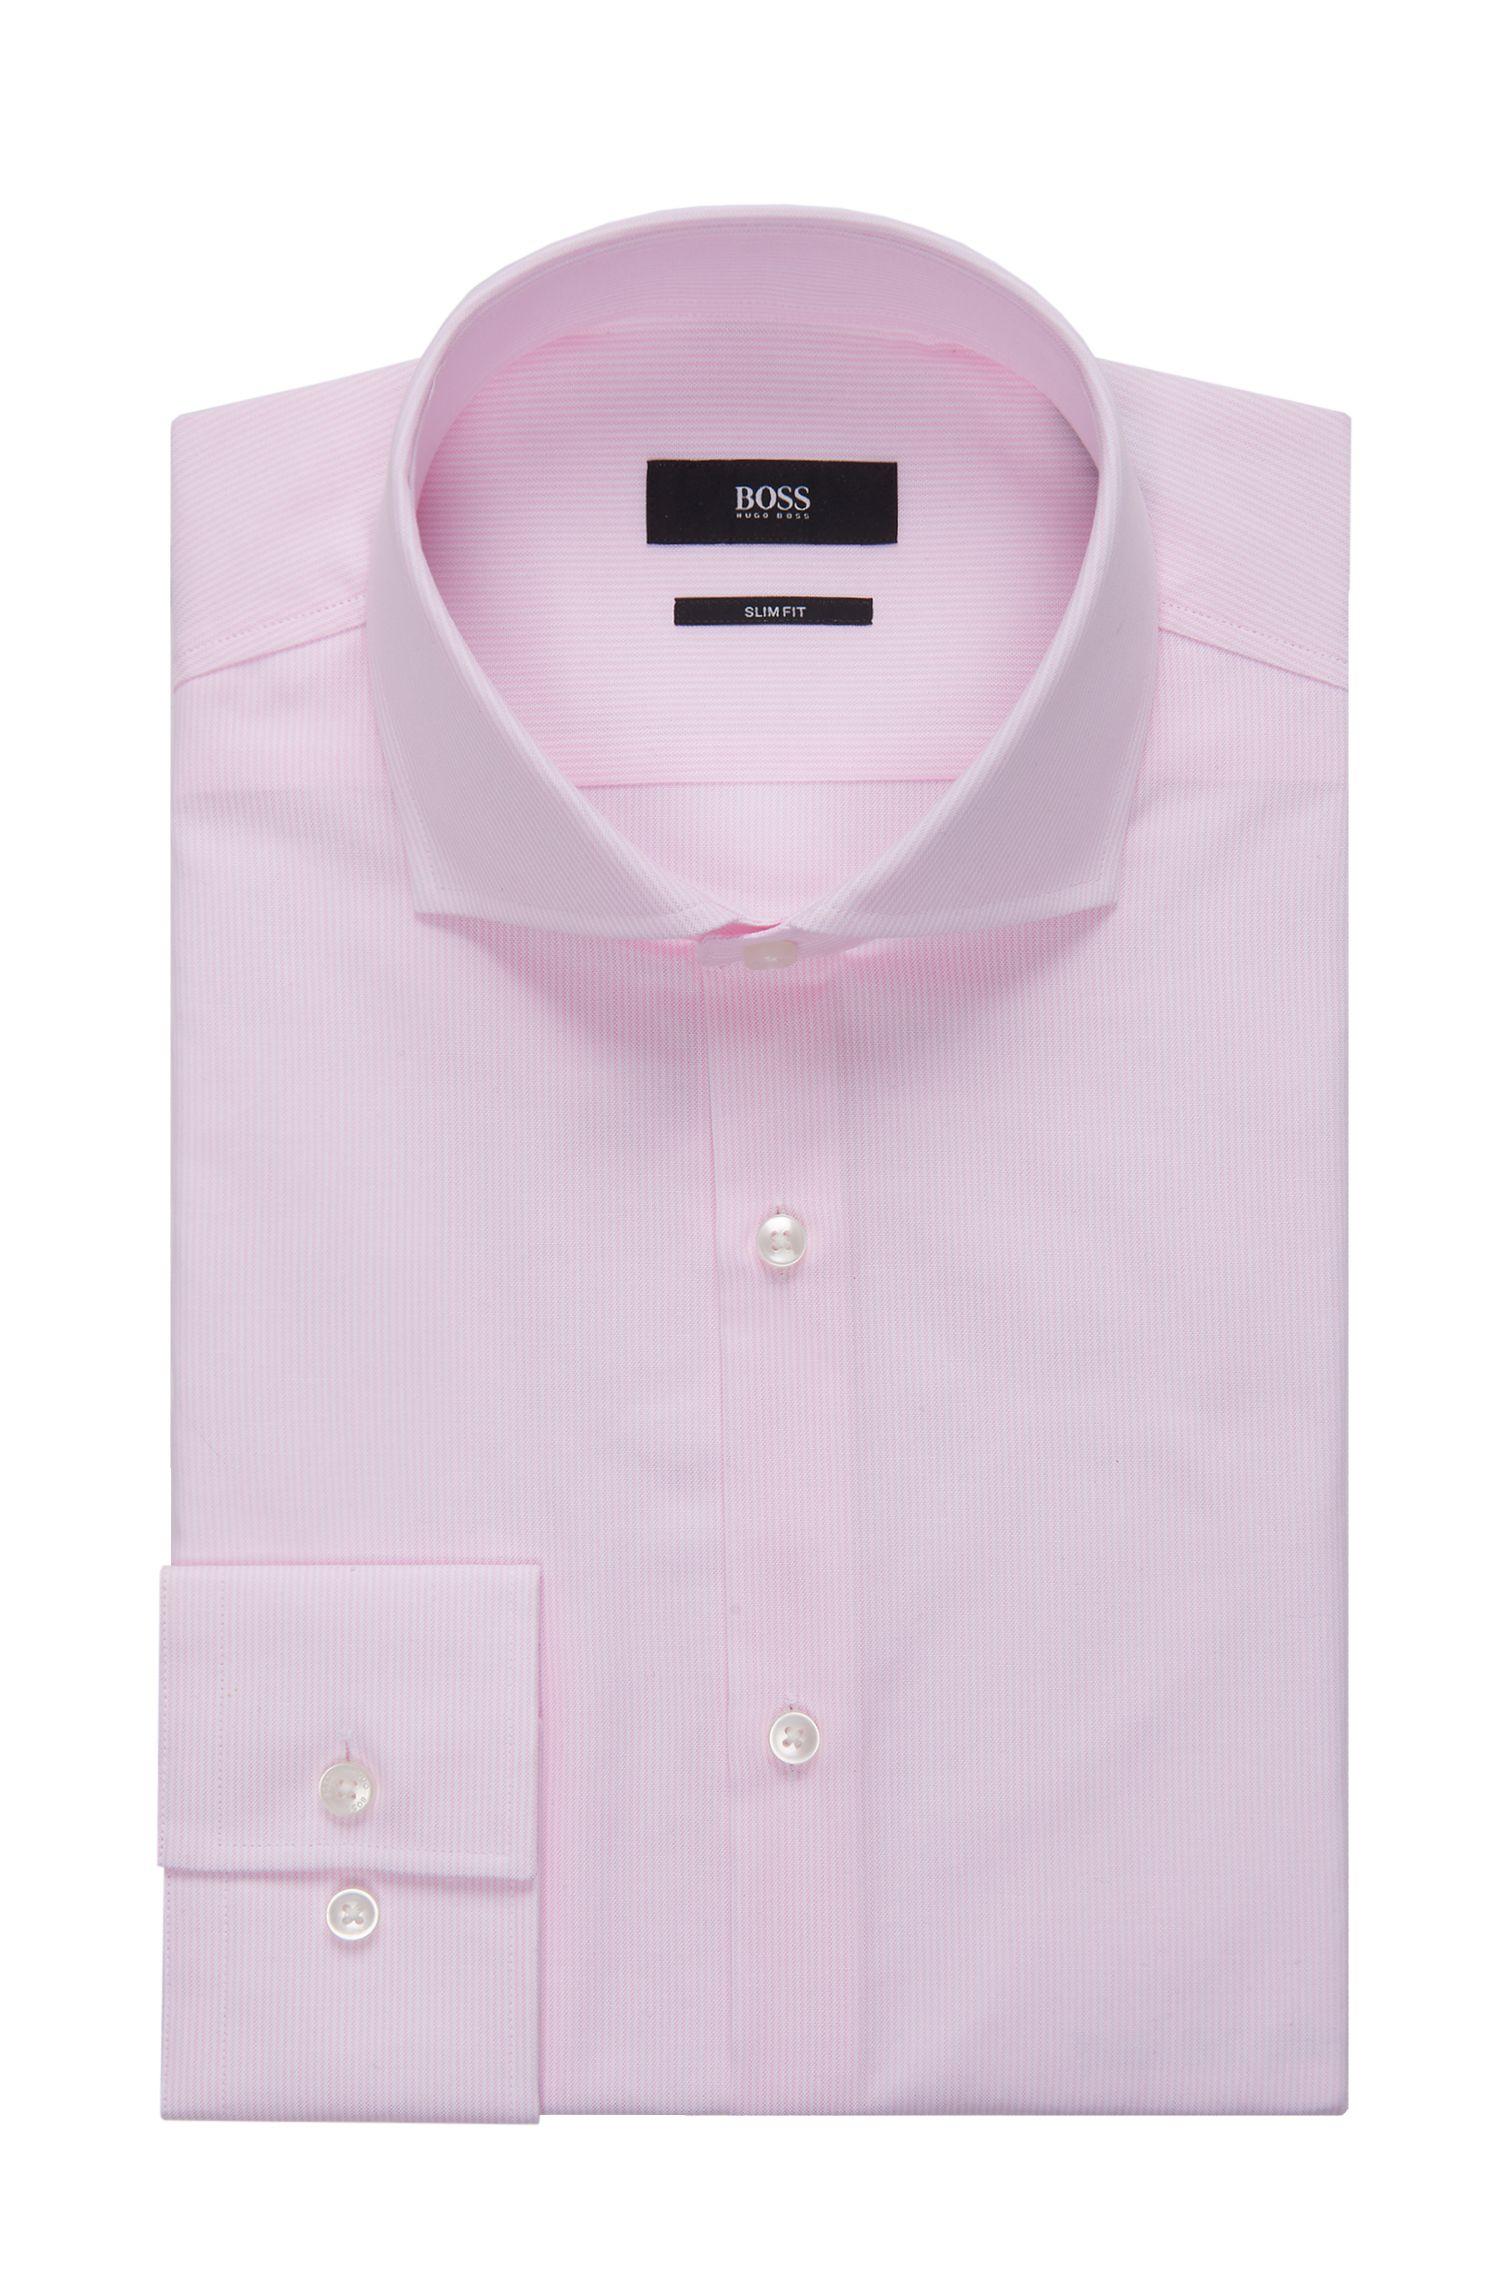 Striped Cotton Patterned Dress Shirt, Slim Fit | Jason